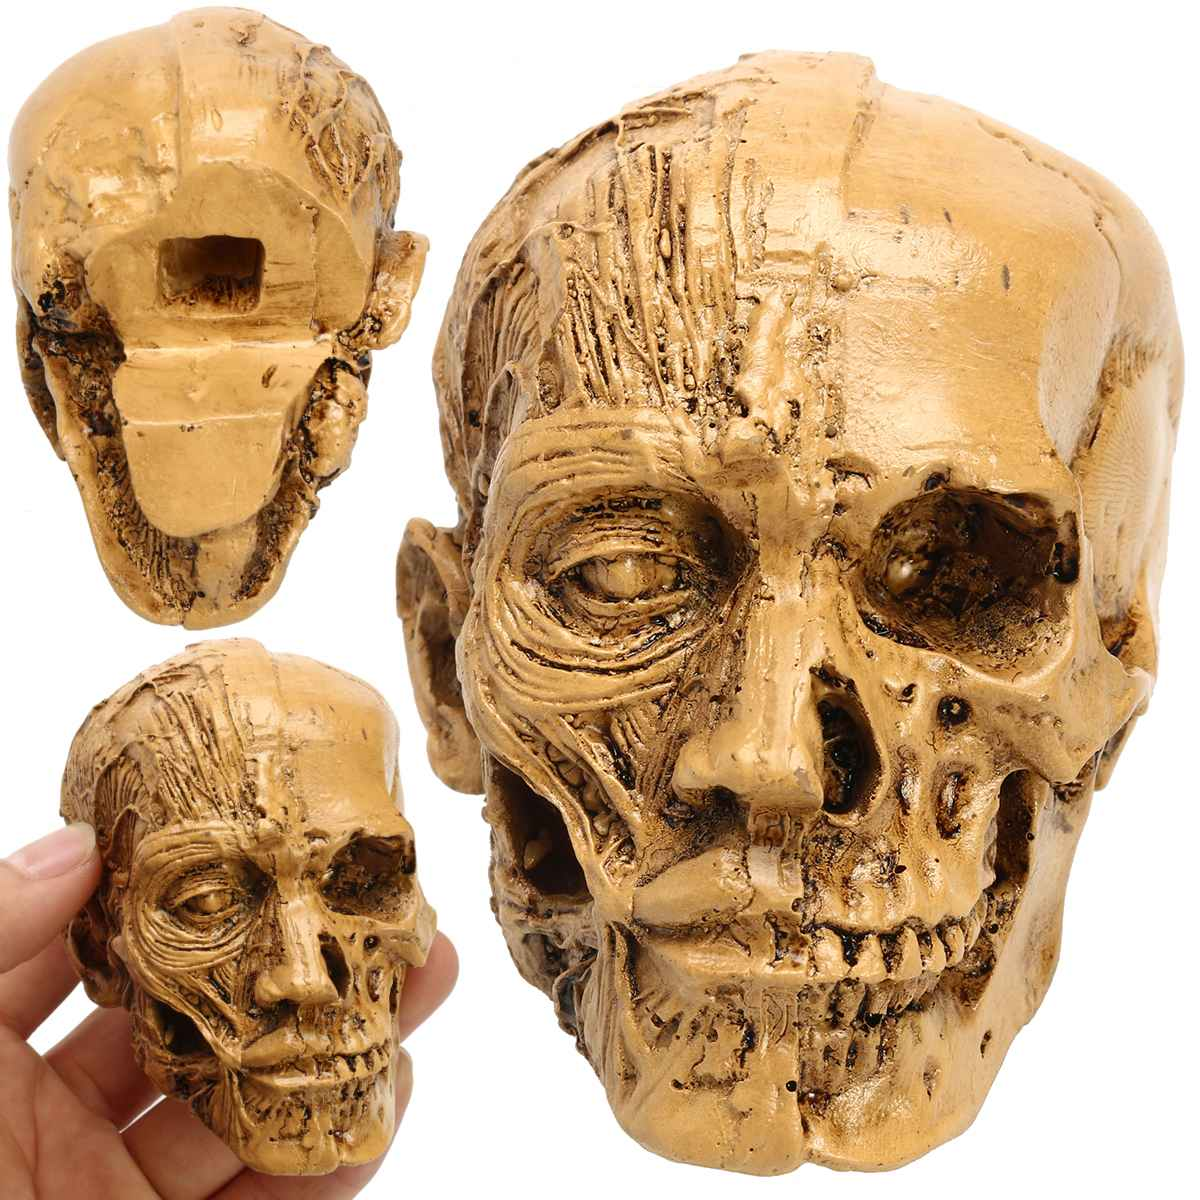 9x5.5cm Human Skull Resin Model Anatomical Medical Teaching Skeleton Head Muscle Bone School Educational Head Skull Bone Model9x5.5cm Human Skull Resin Model Anatomical Medical Teaching Skeleton Head Muscle Bone School Educational Head Skull Bone Model